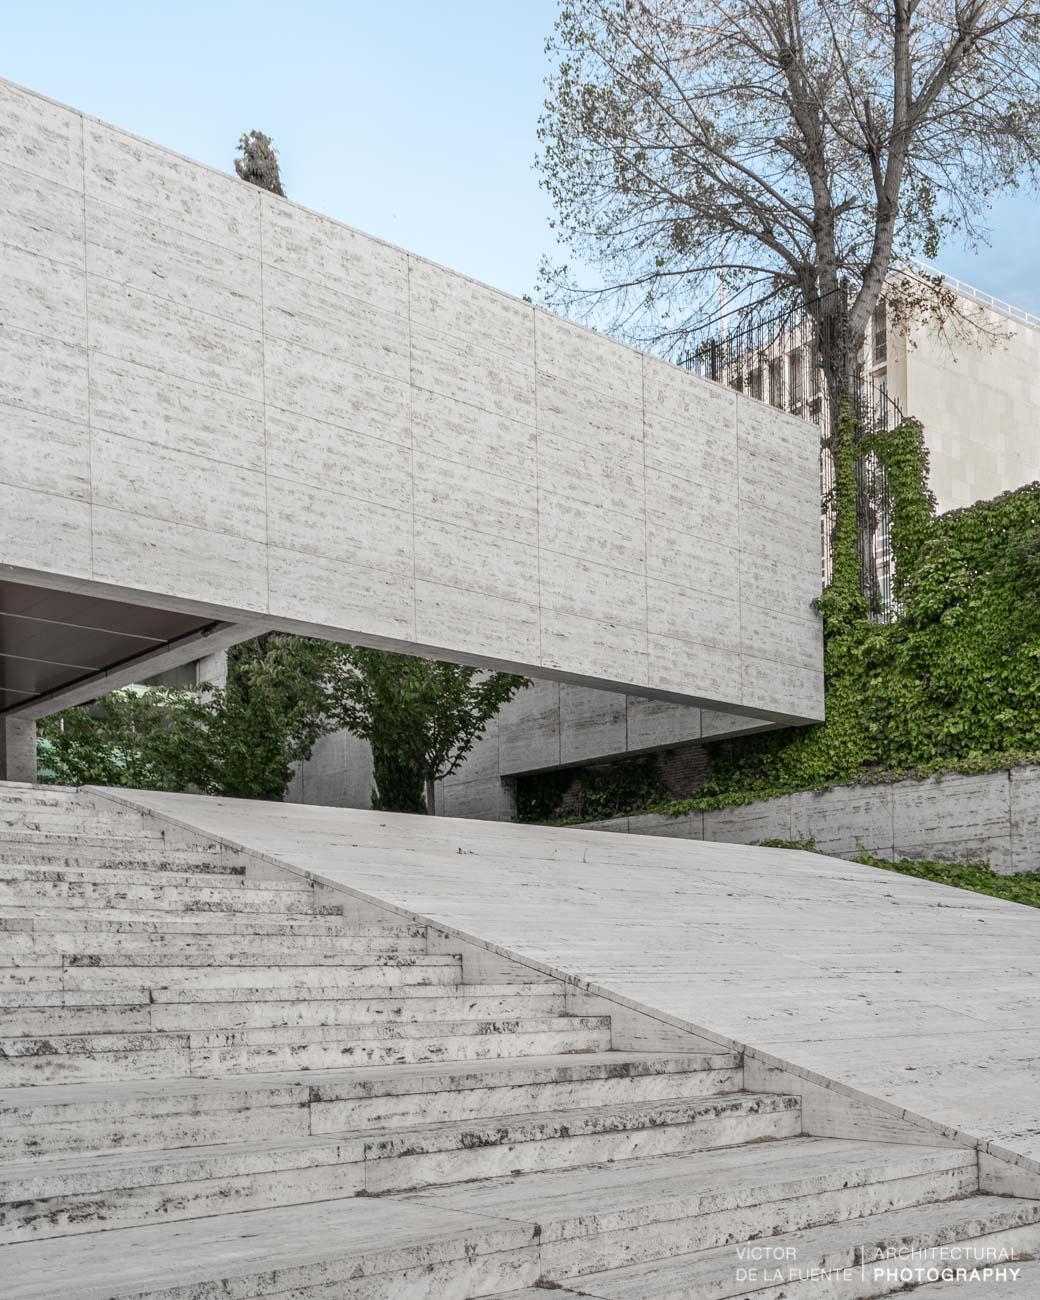 fotografia de arquitectura escaleras edificio de hormigon